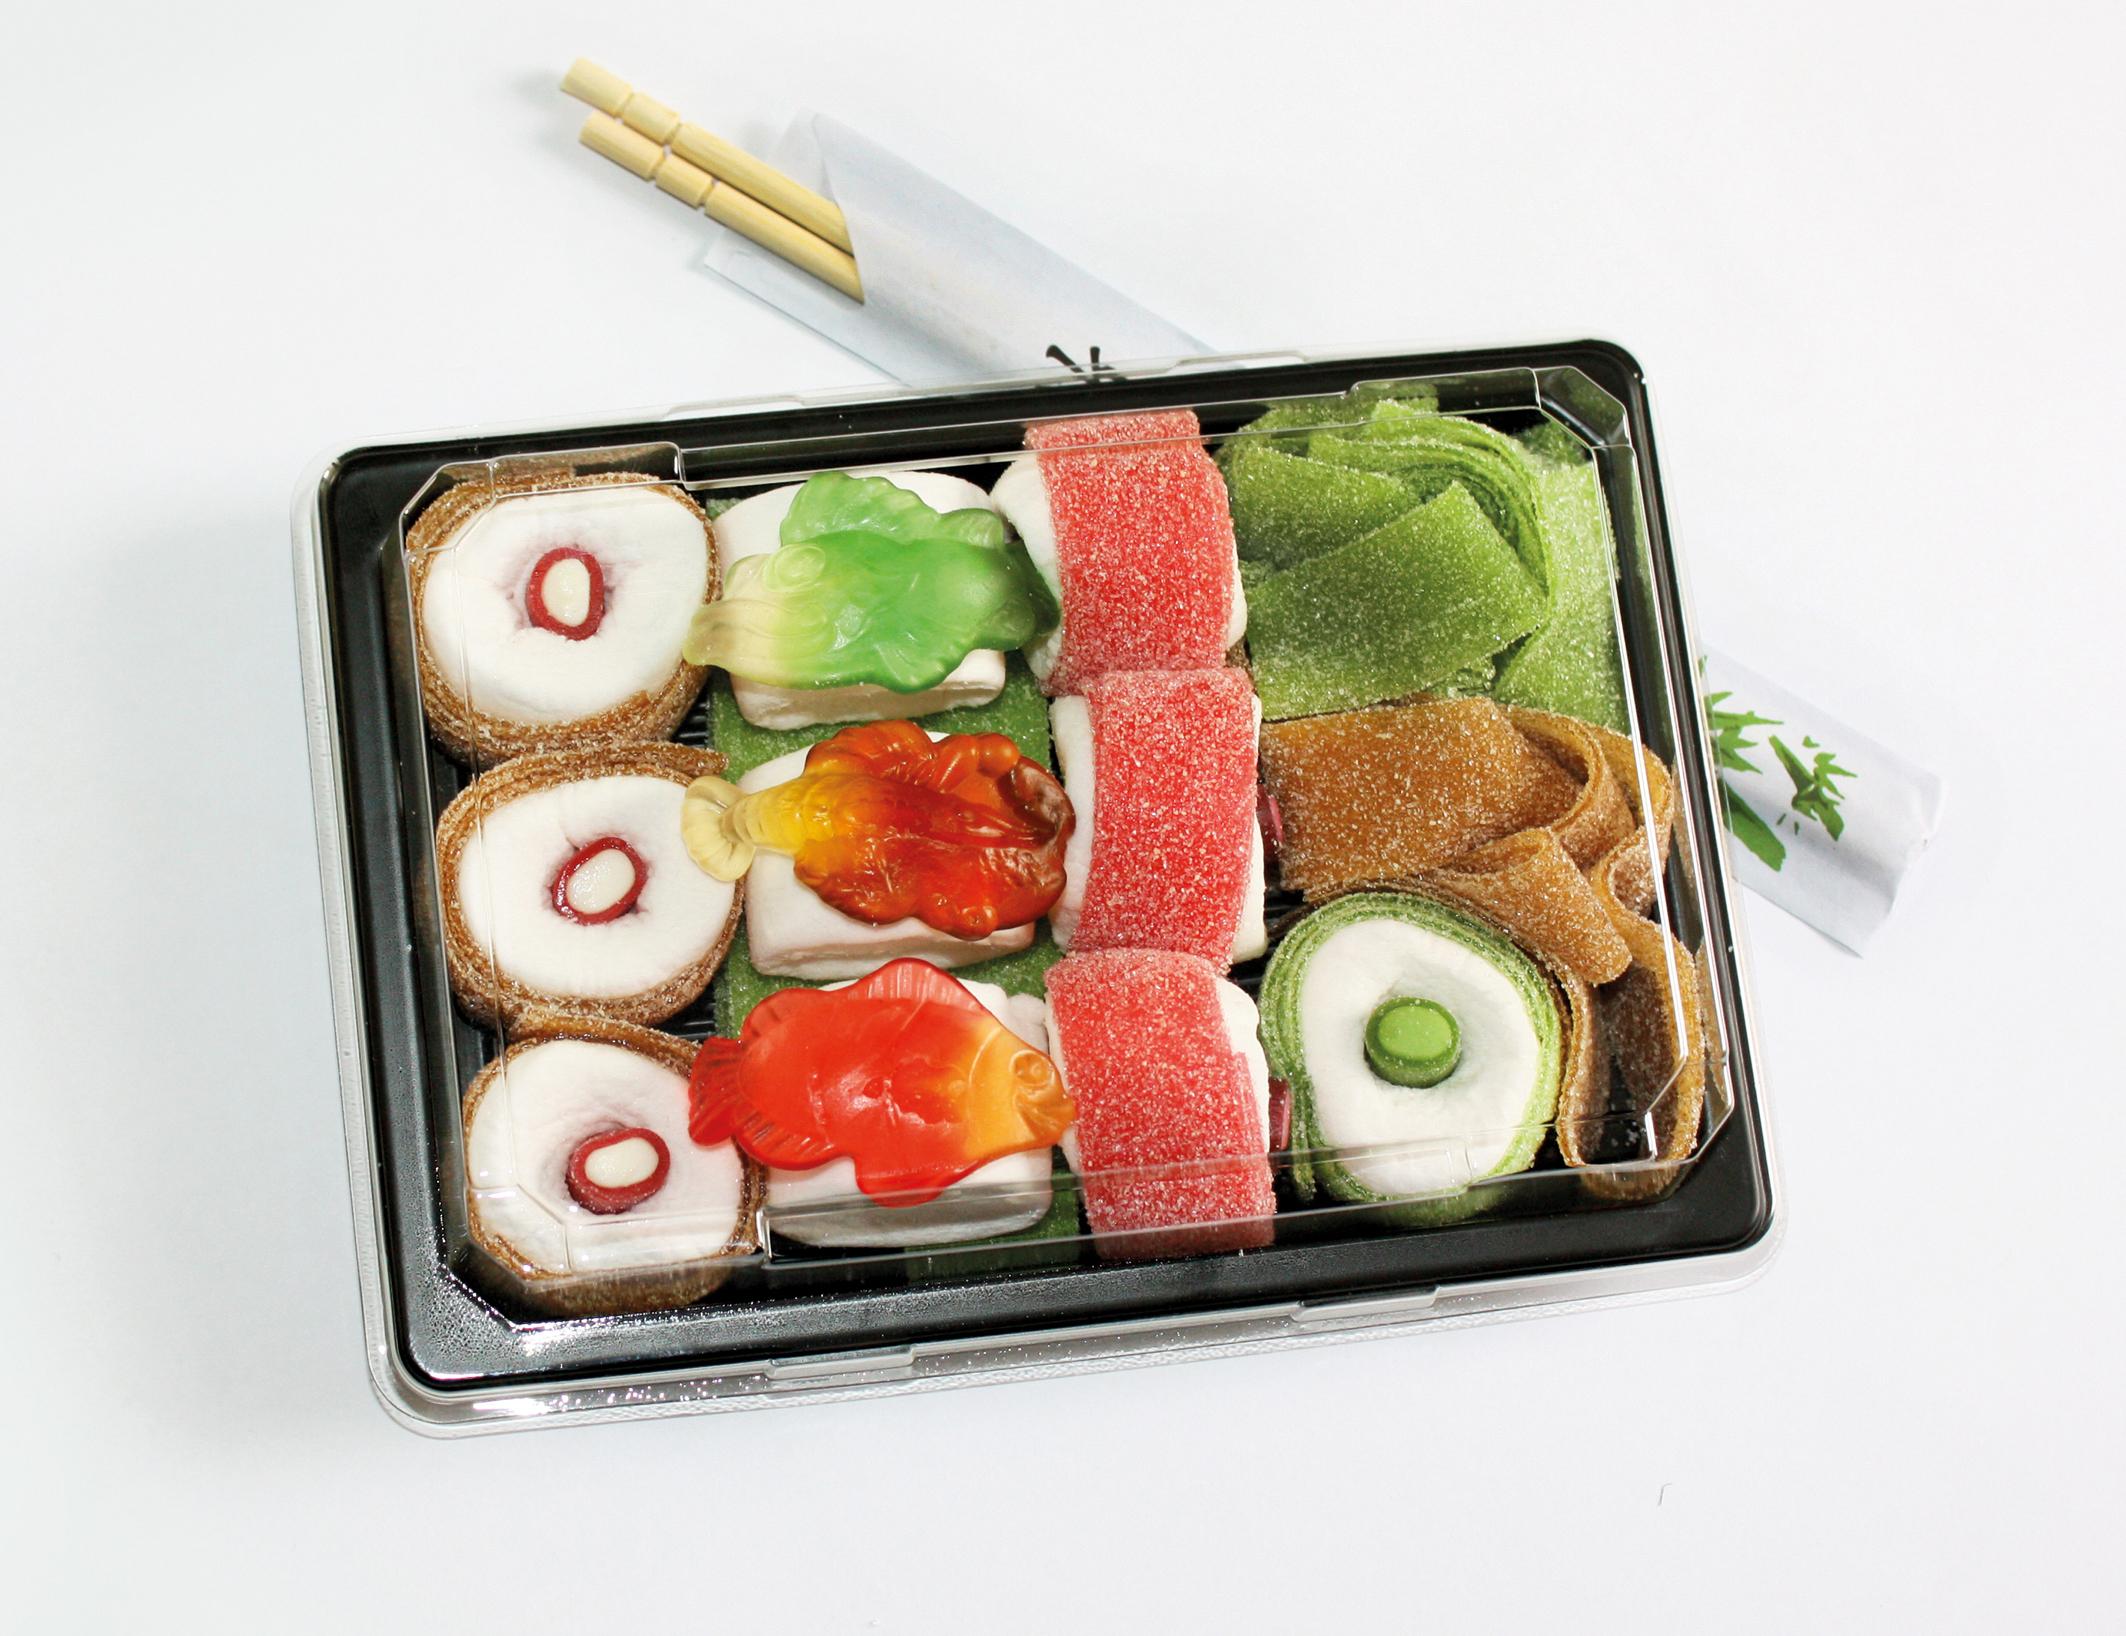 Hatu keine Möhrn? Hatu  Sushi?